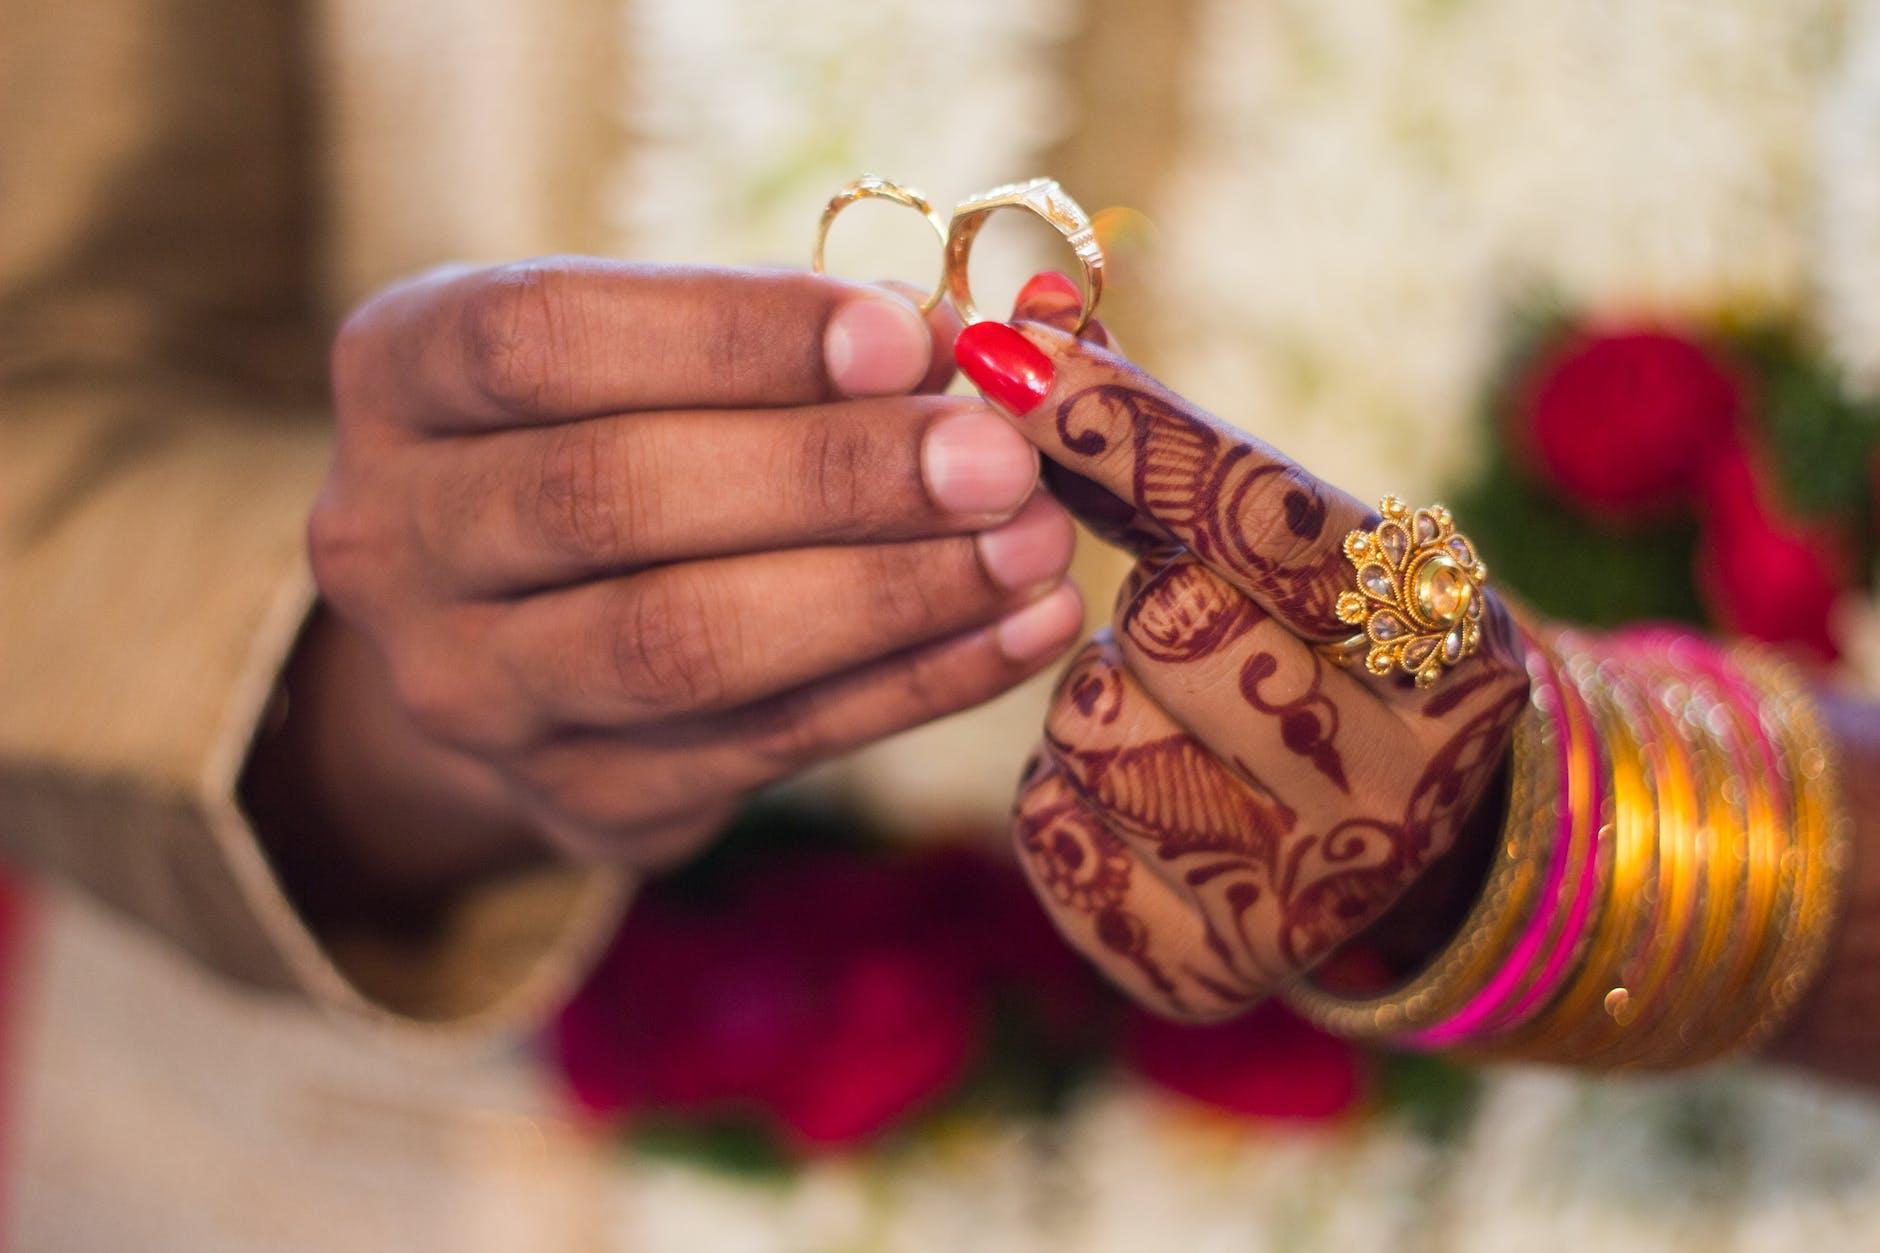 indian wedding couples marriage dilkerishte